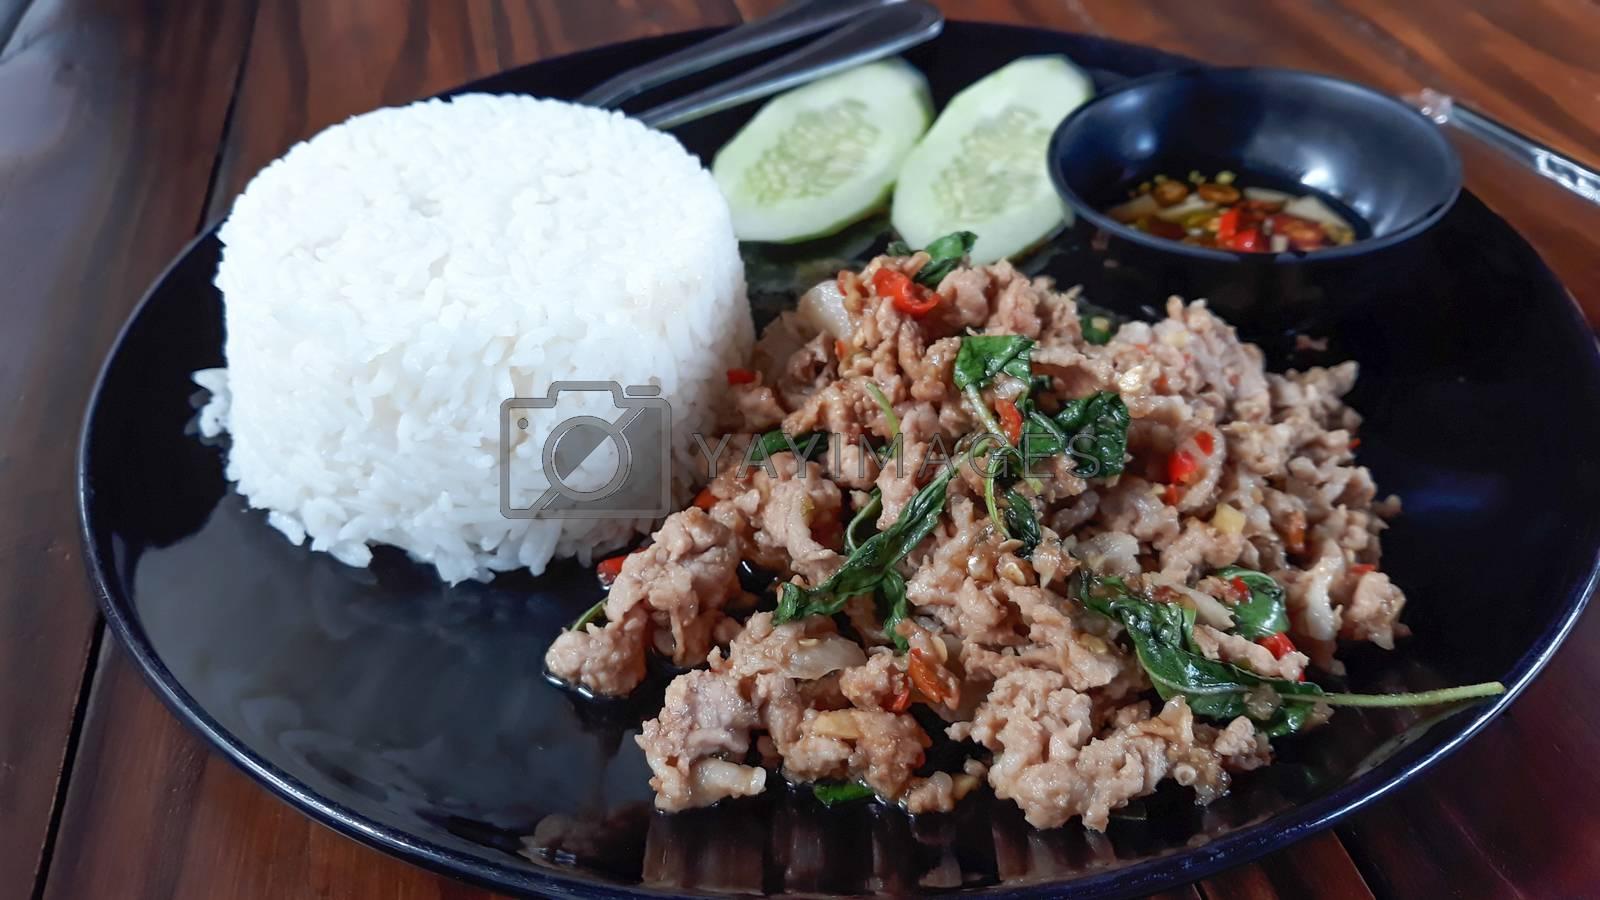 Rice with stir-fried pork and basil ,Thai food. by Nunnicha Supagrit